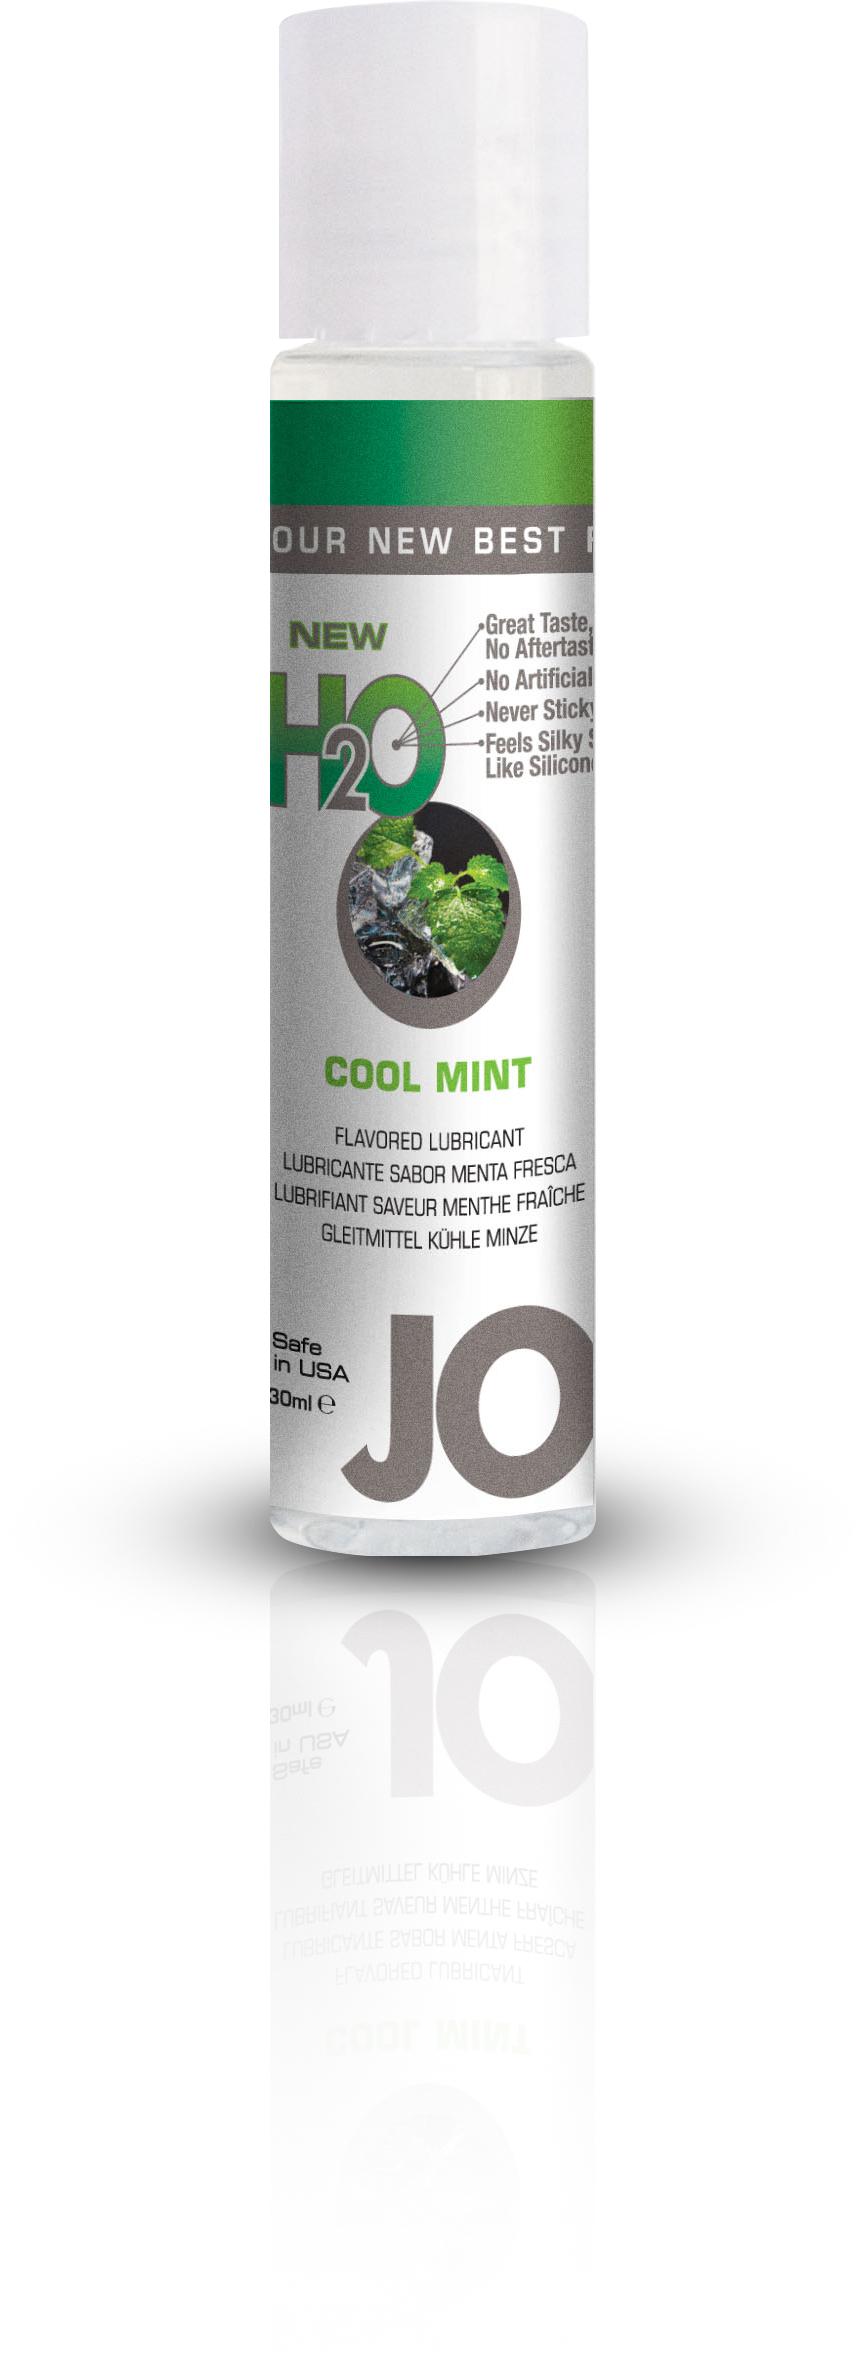 30383_JO_h2o_flavored_lubricant_1oz_1oz_mint.jpg